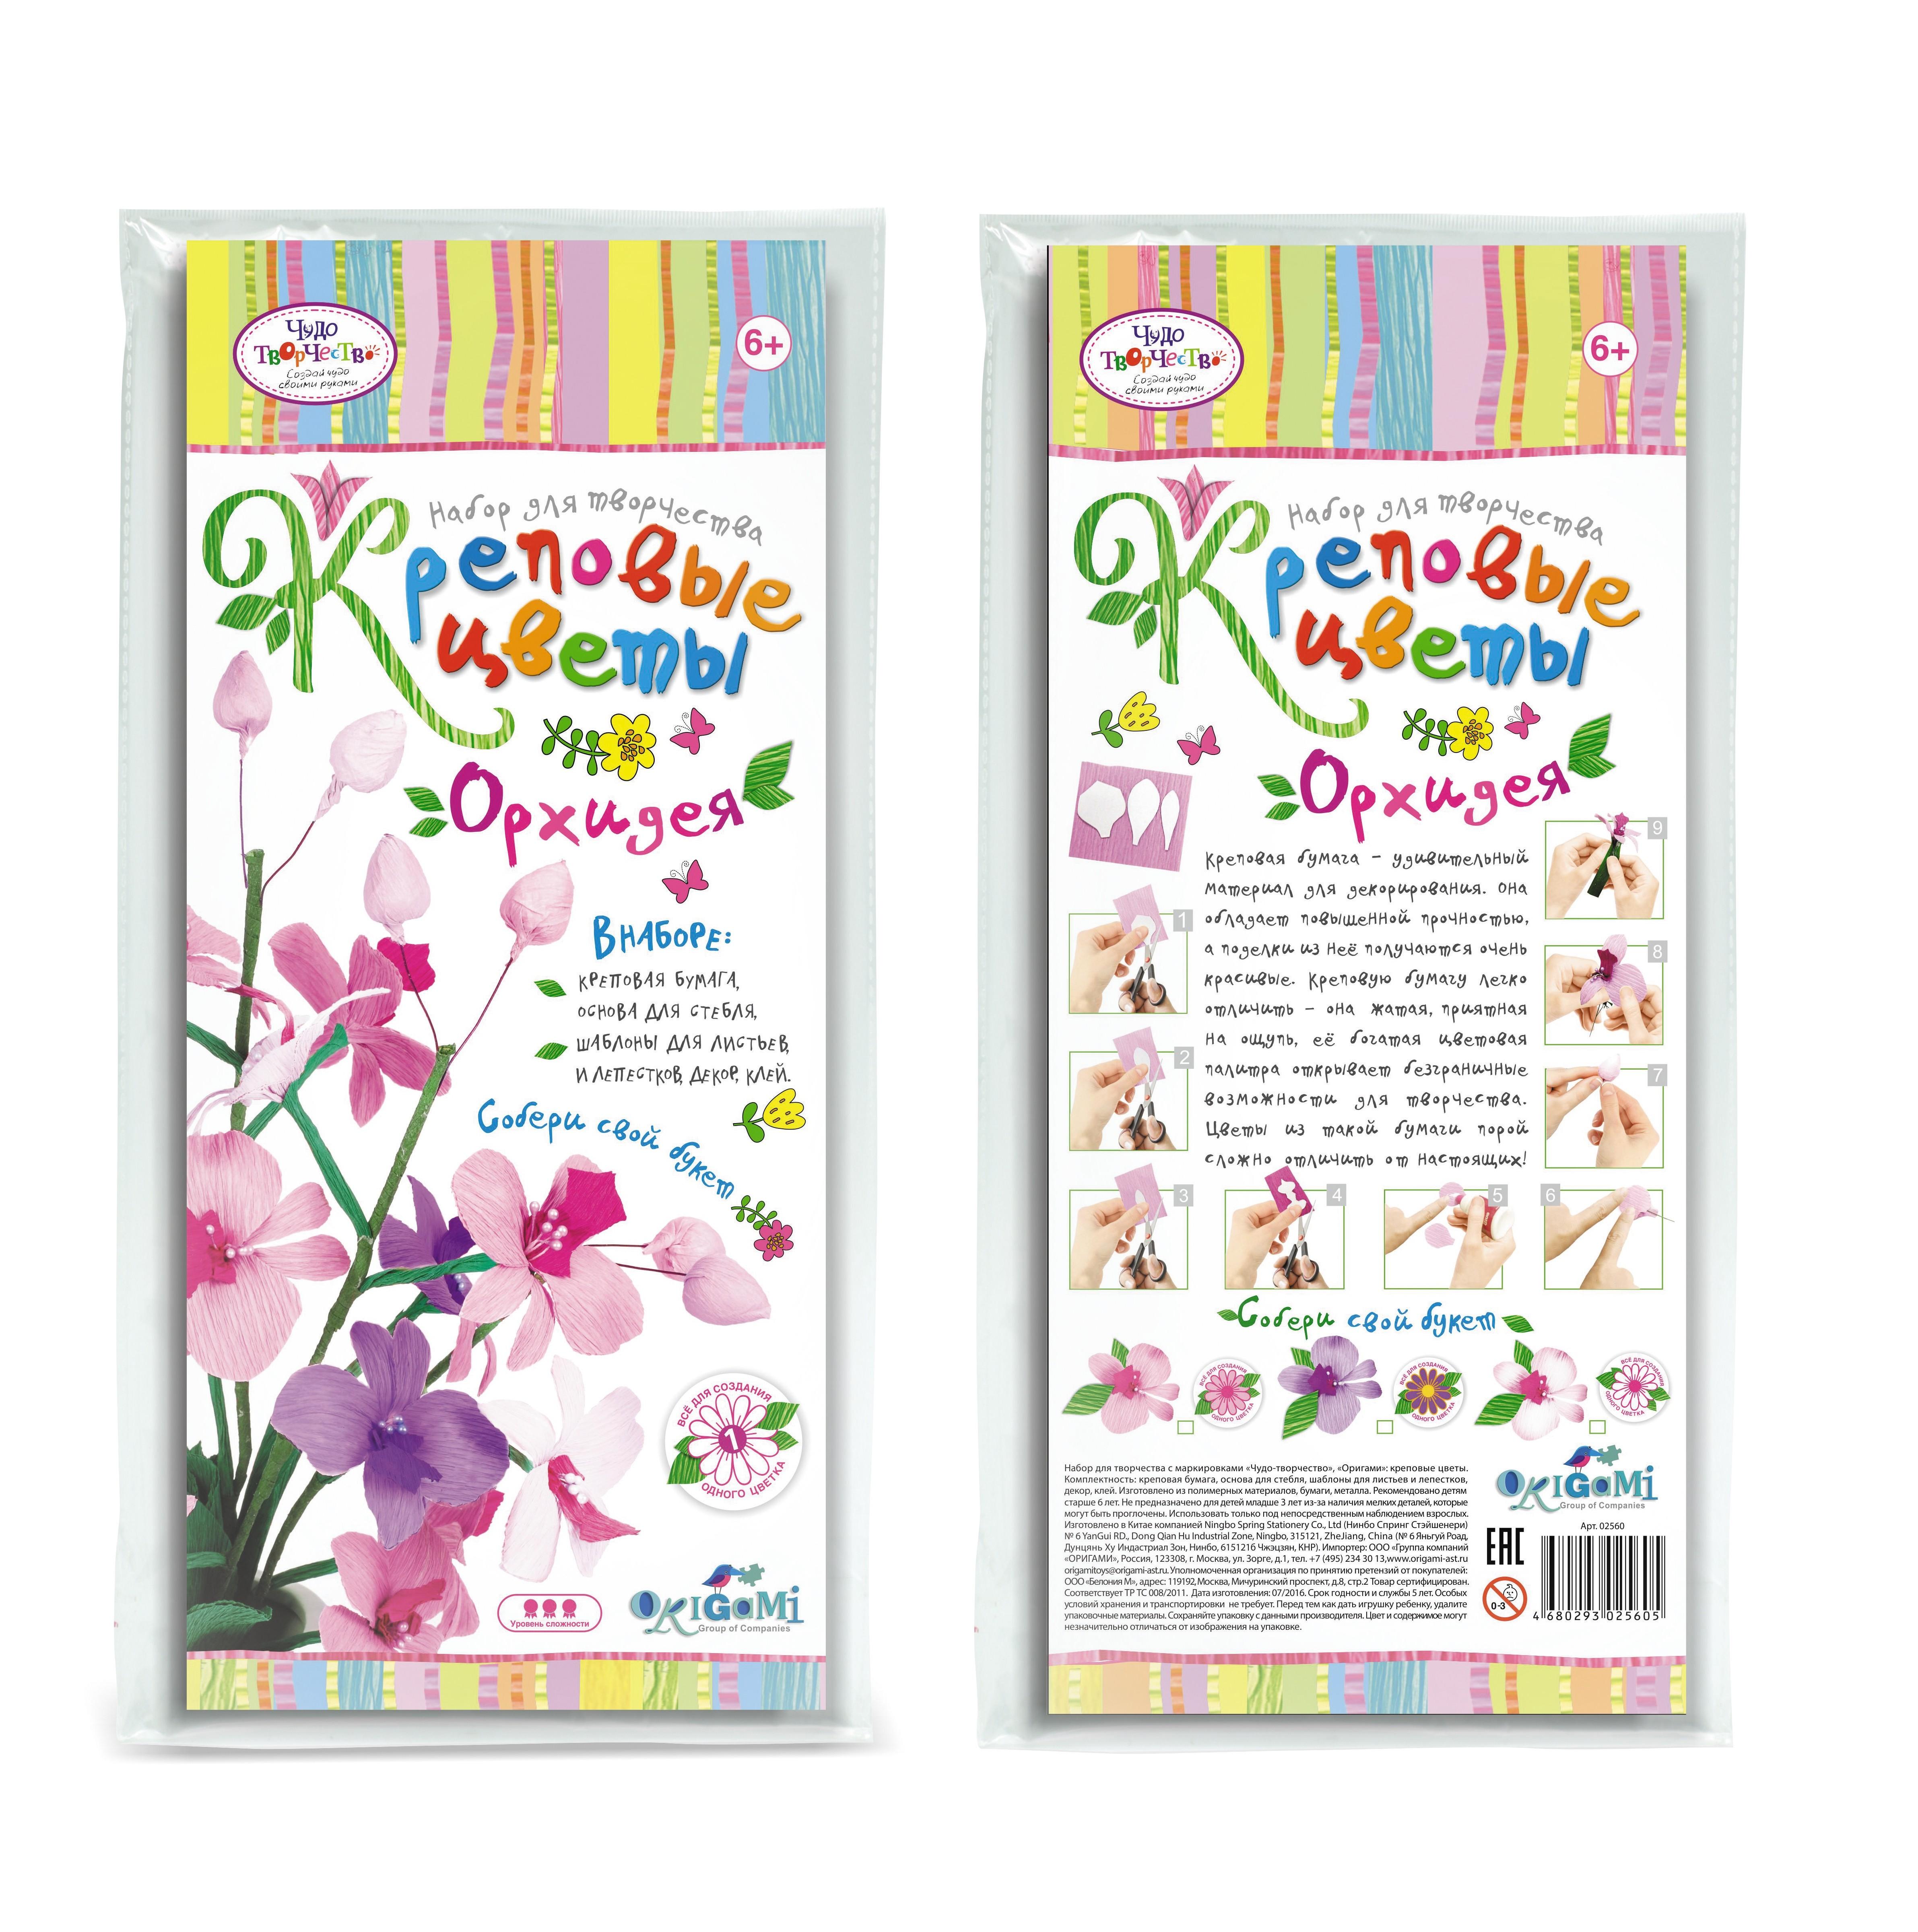 Наборы для творчества Origami Креповые цветы Орхидея seicane 8 core android 8 0 9 1din car radio gps navi for bmw 3 series e46 m3 316i 318i 320i 323i 325i with wifi bluetooth 32g